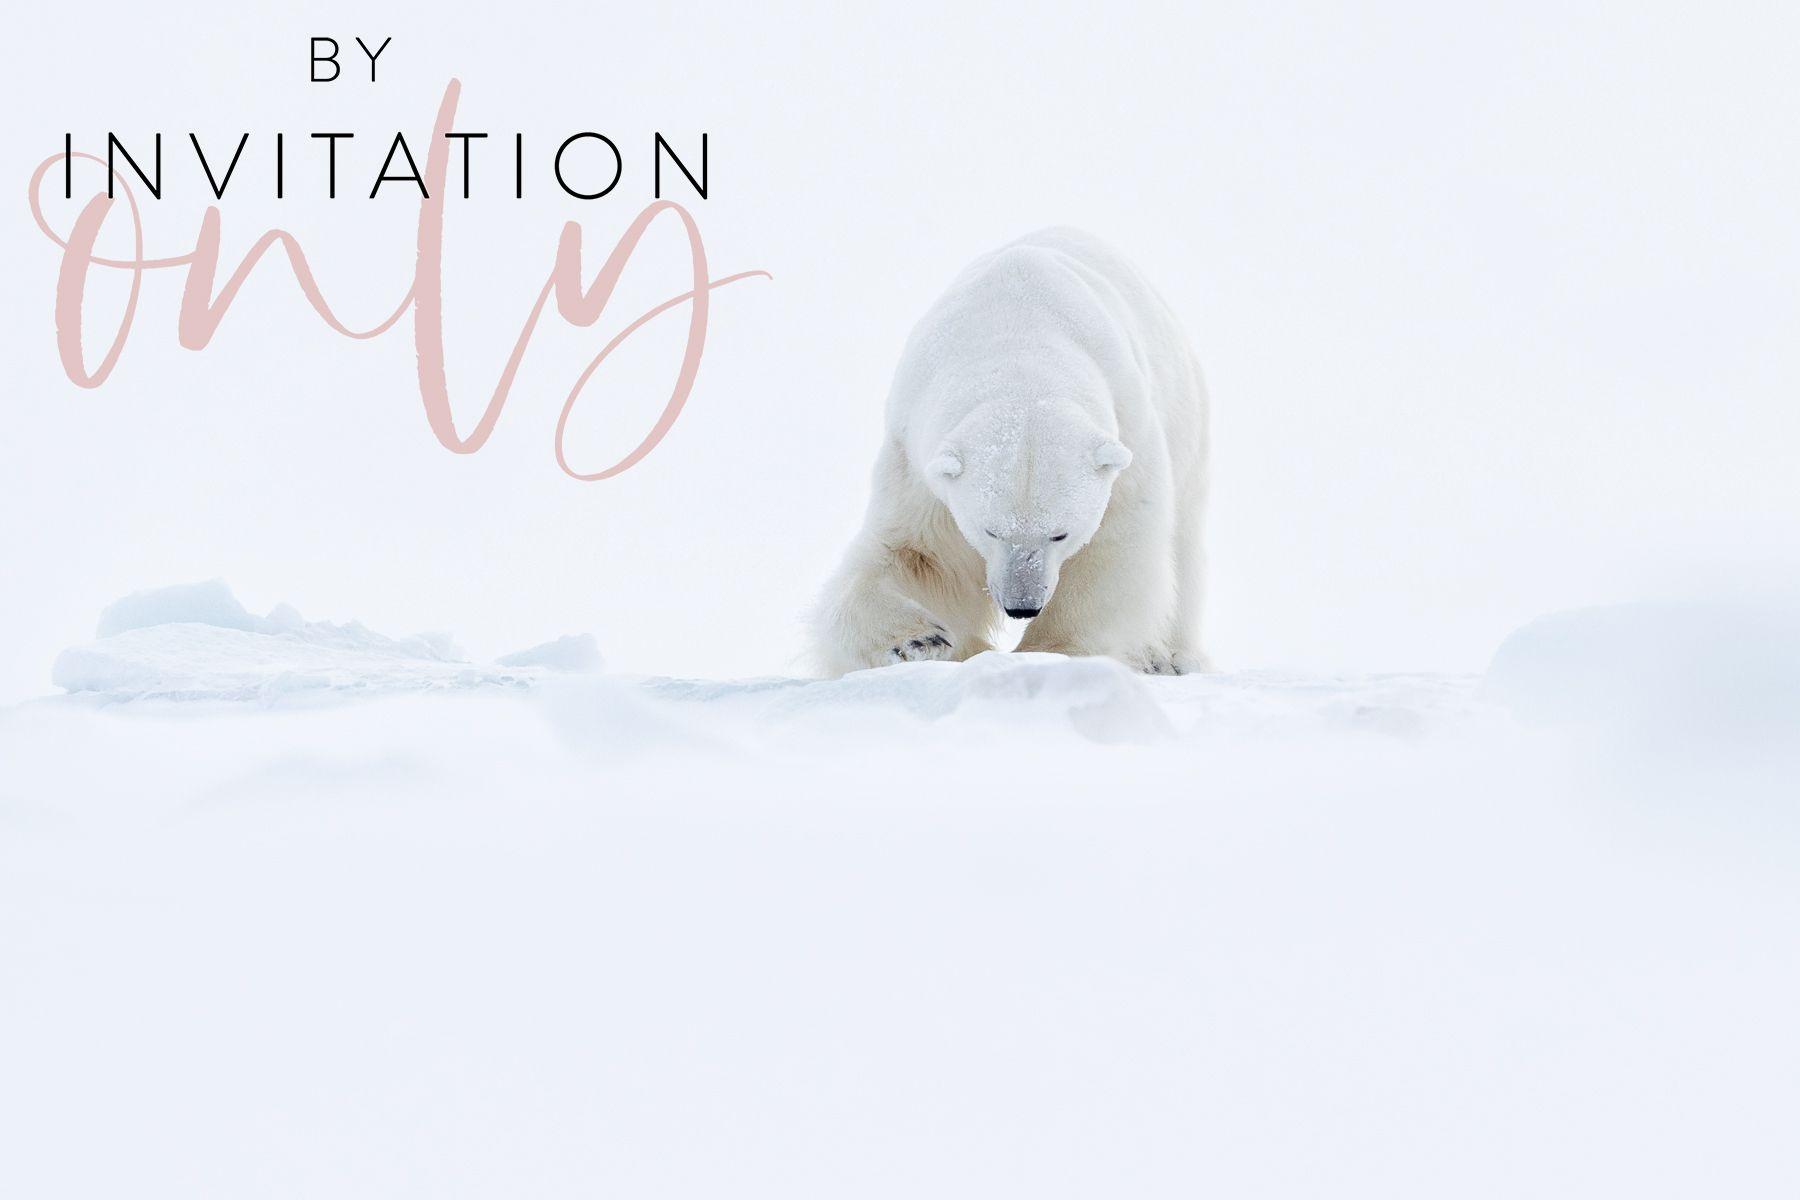 Polars Expedition with Joshua Holko